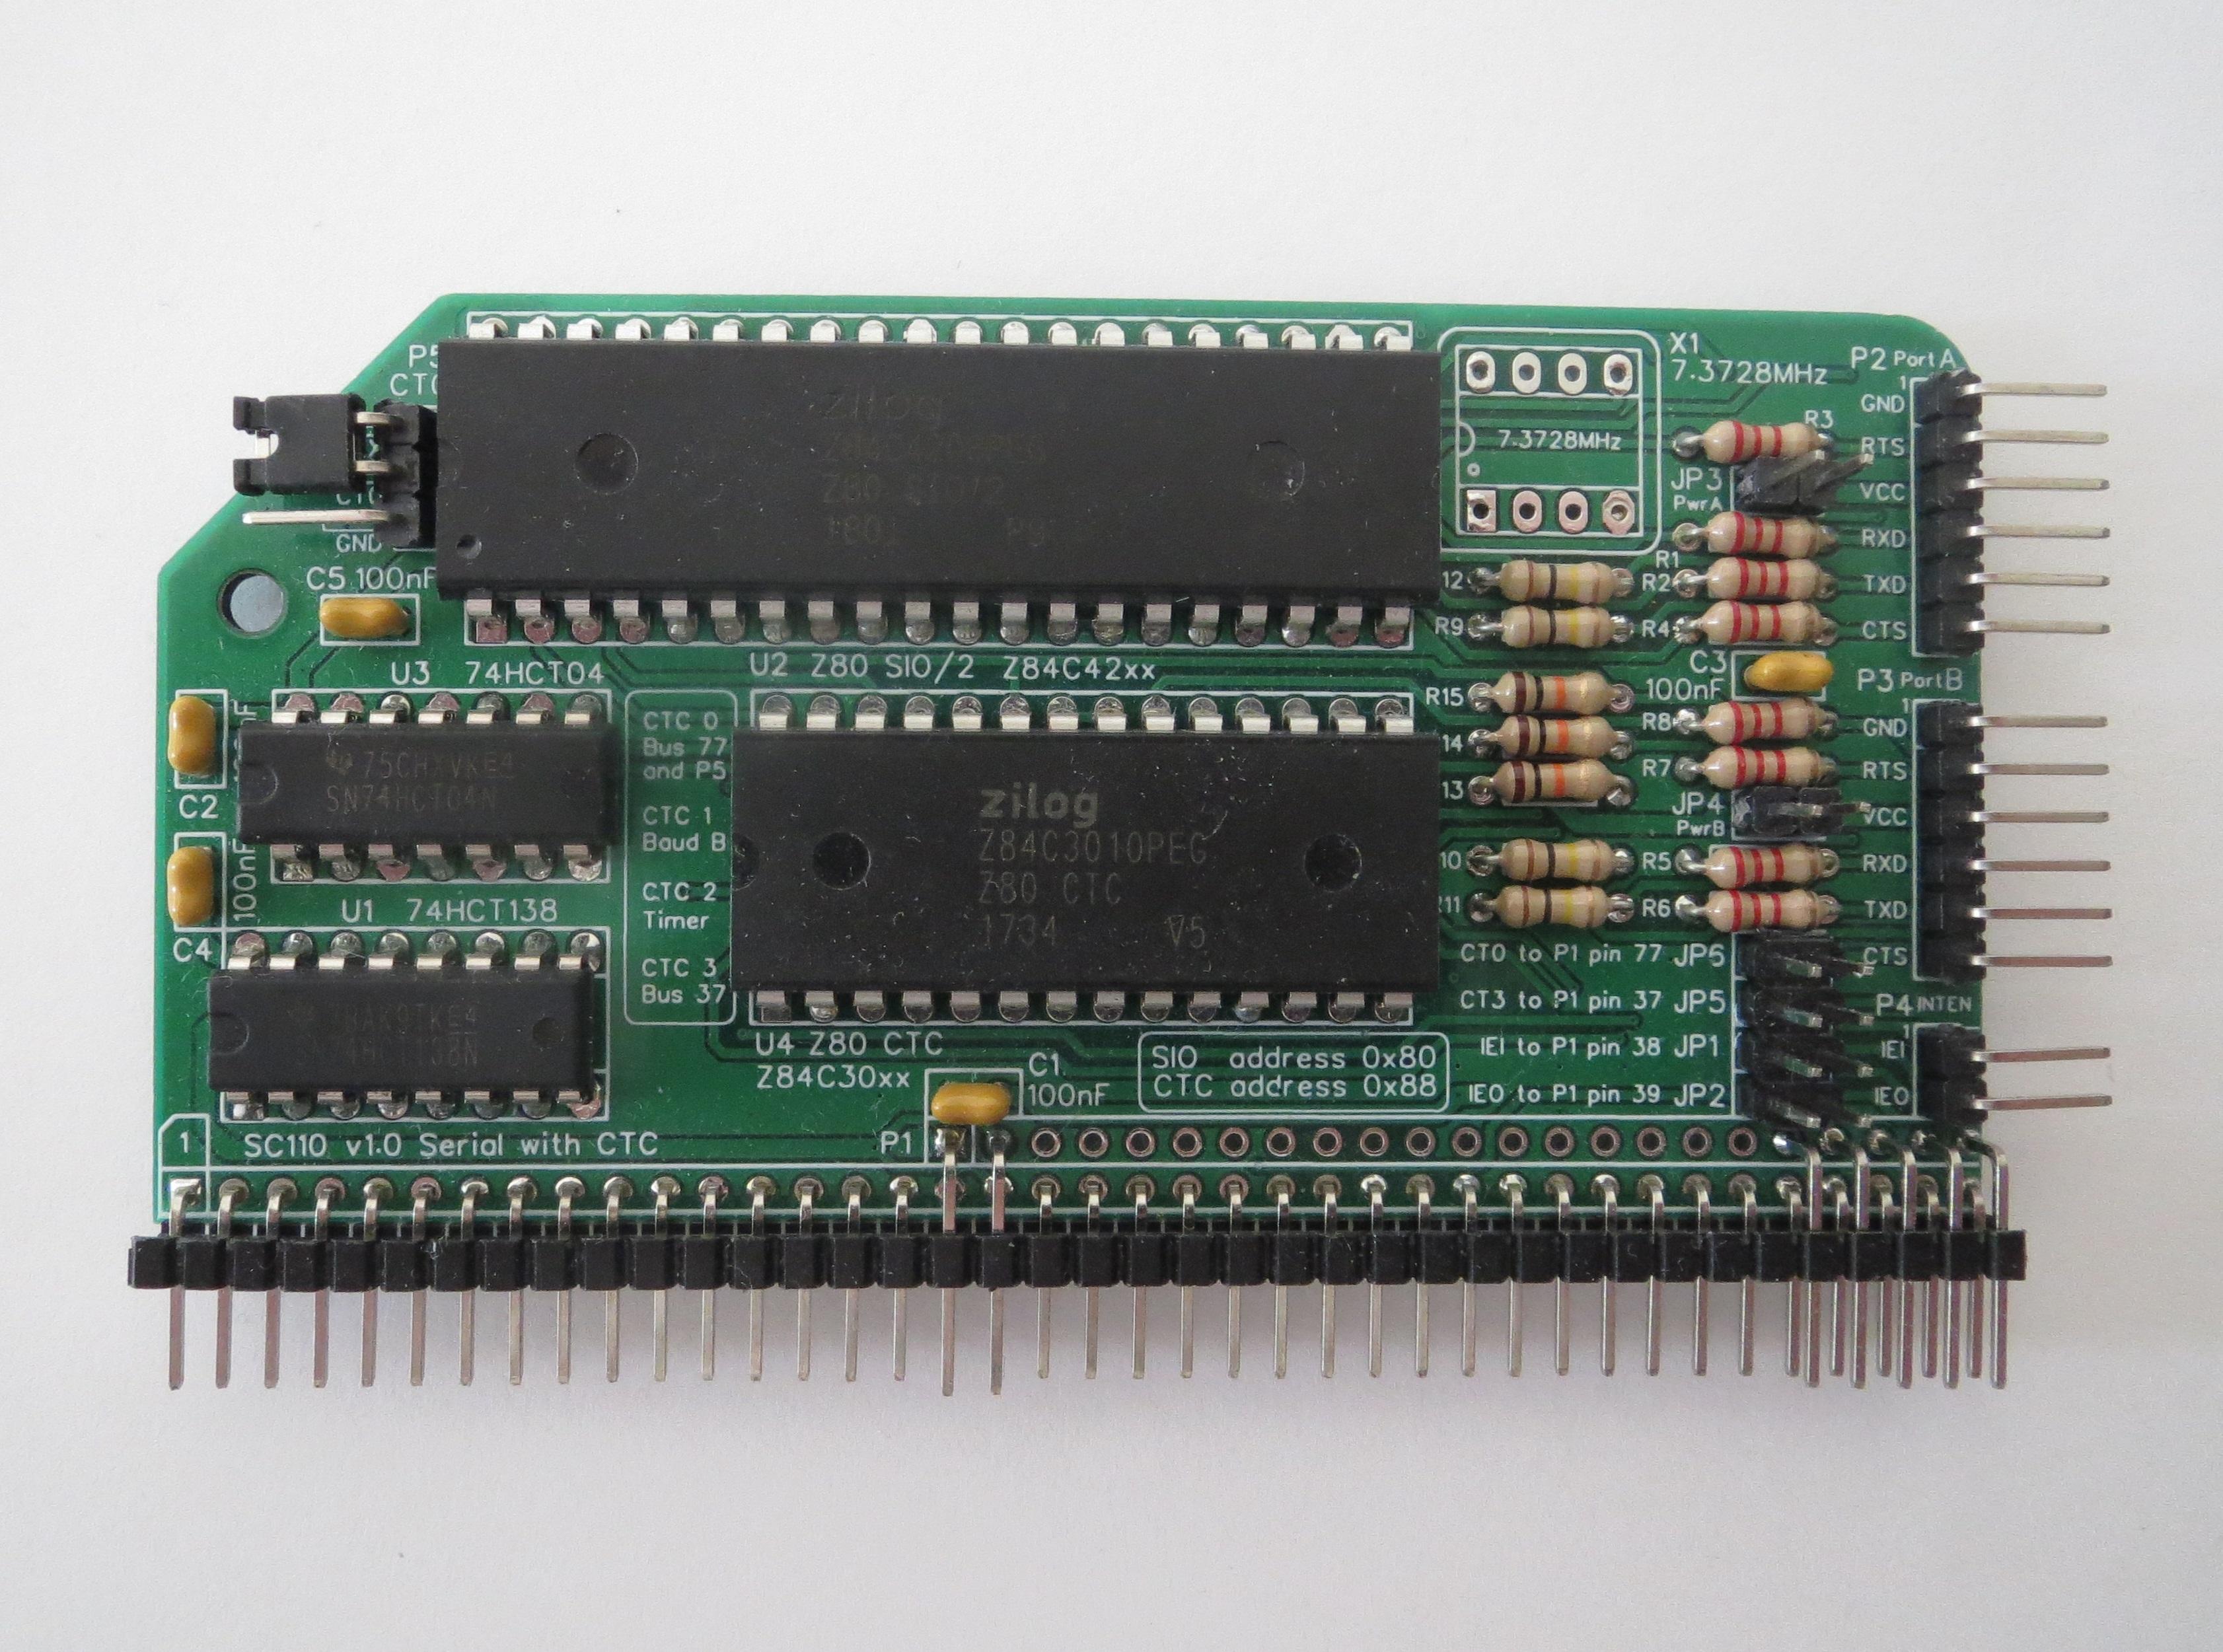 SC110 assembled